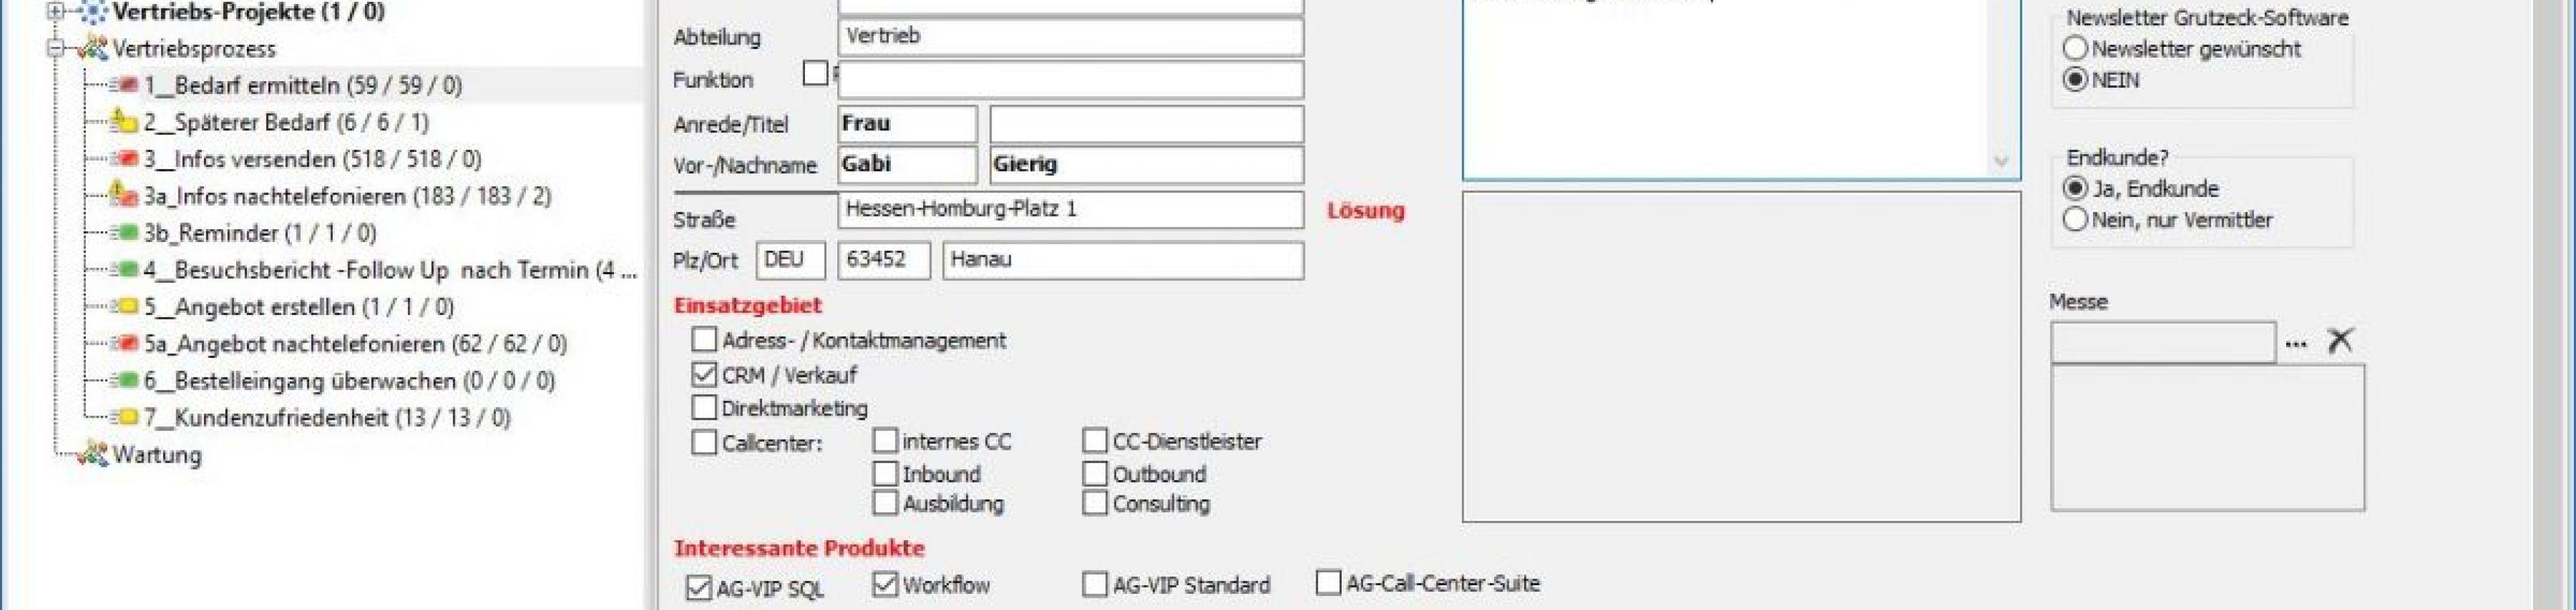 CRM Software AG-VIP - Option Workflow: Bearbeitung Vorgang im Vertriebsprozess